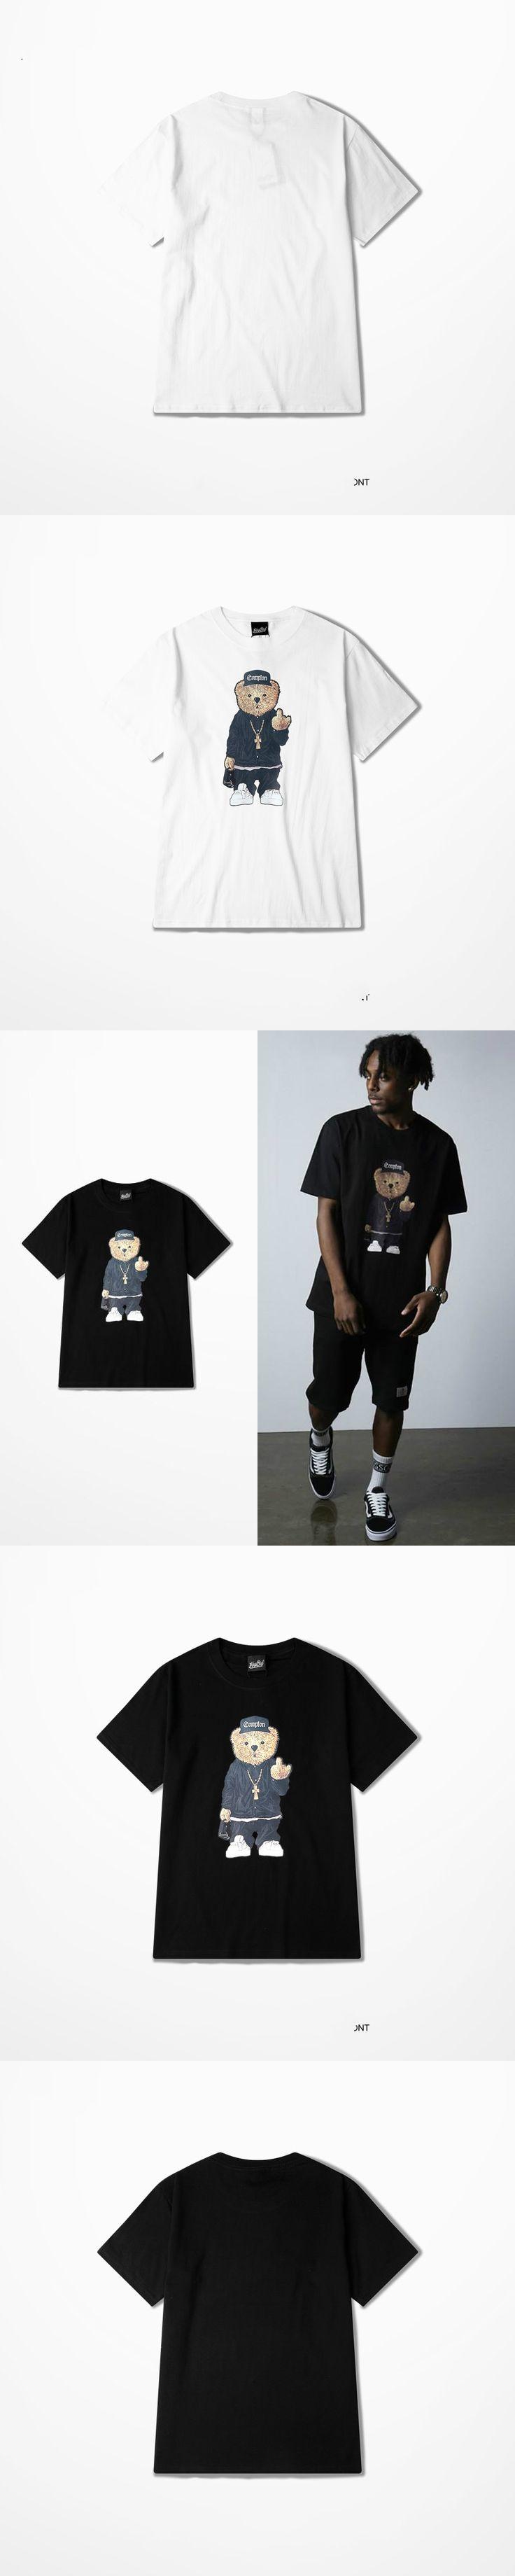 Dr. Dre N.w.a. T-shirt Straight Outta Compton Movie Nwa Ice Cube Dr Dre Eazy E Dj Yella Mc Ren Print T-shirts Tom Petty Tee